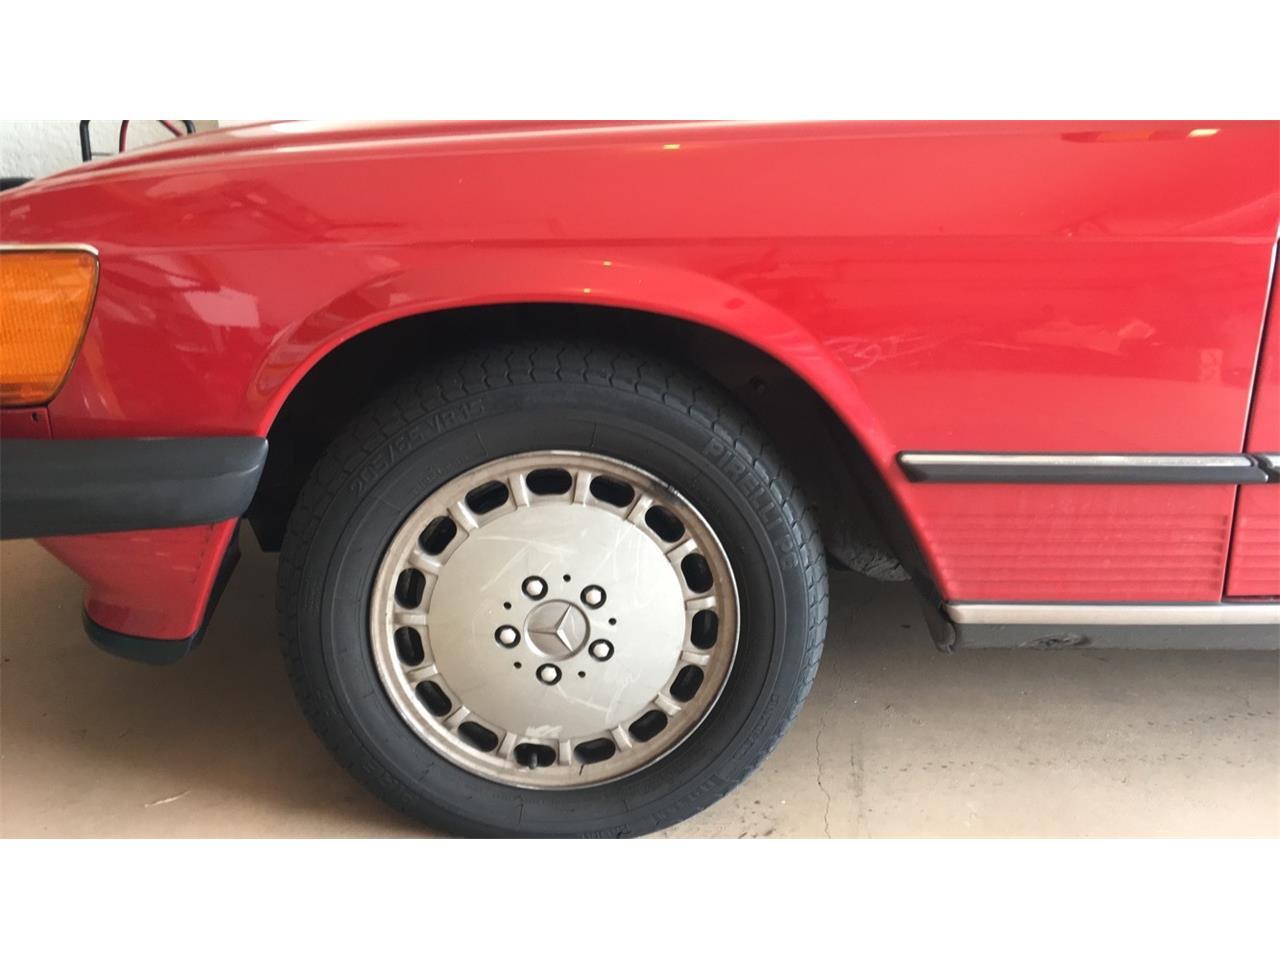 1987 Mercedes-Benz 560SL (CC-1274919) for sale in Naples, Florida